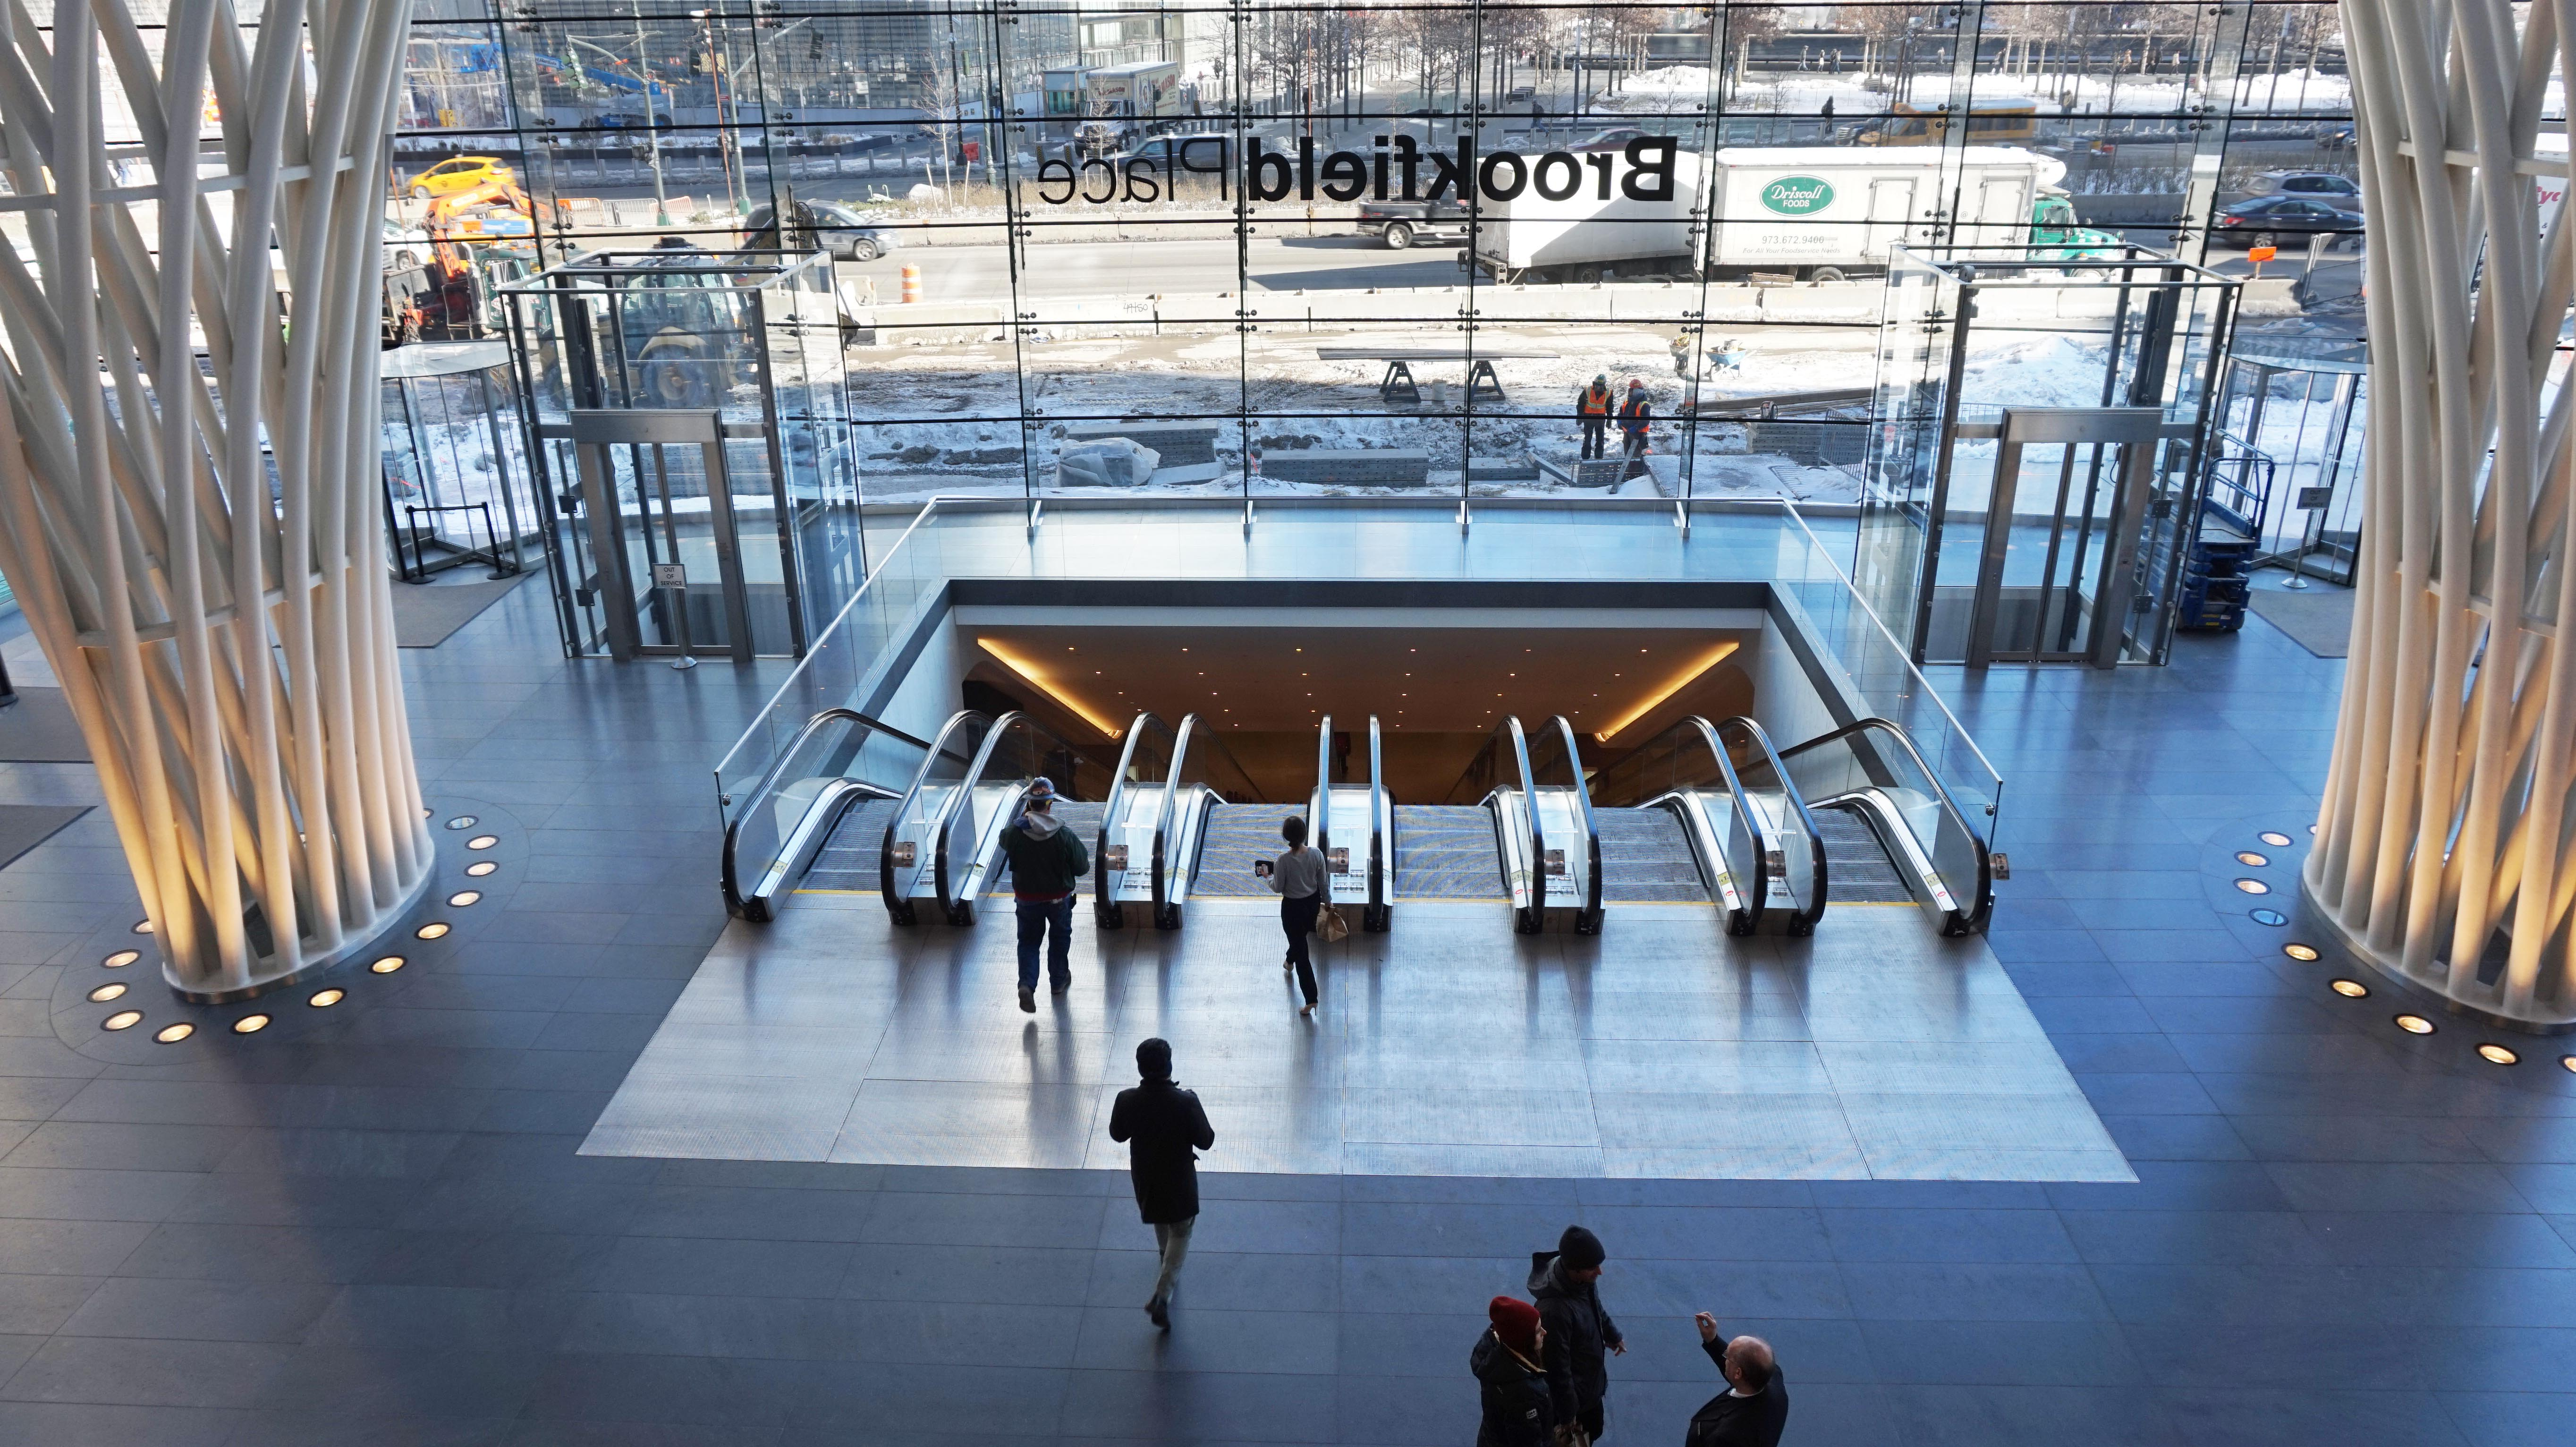 WTC to Brookfield tunnel escalator from balcony